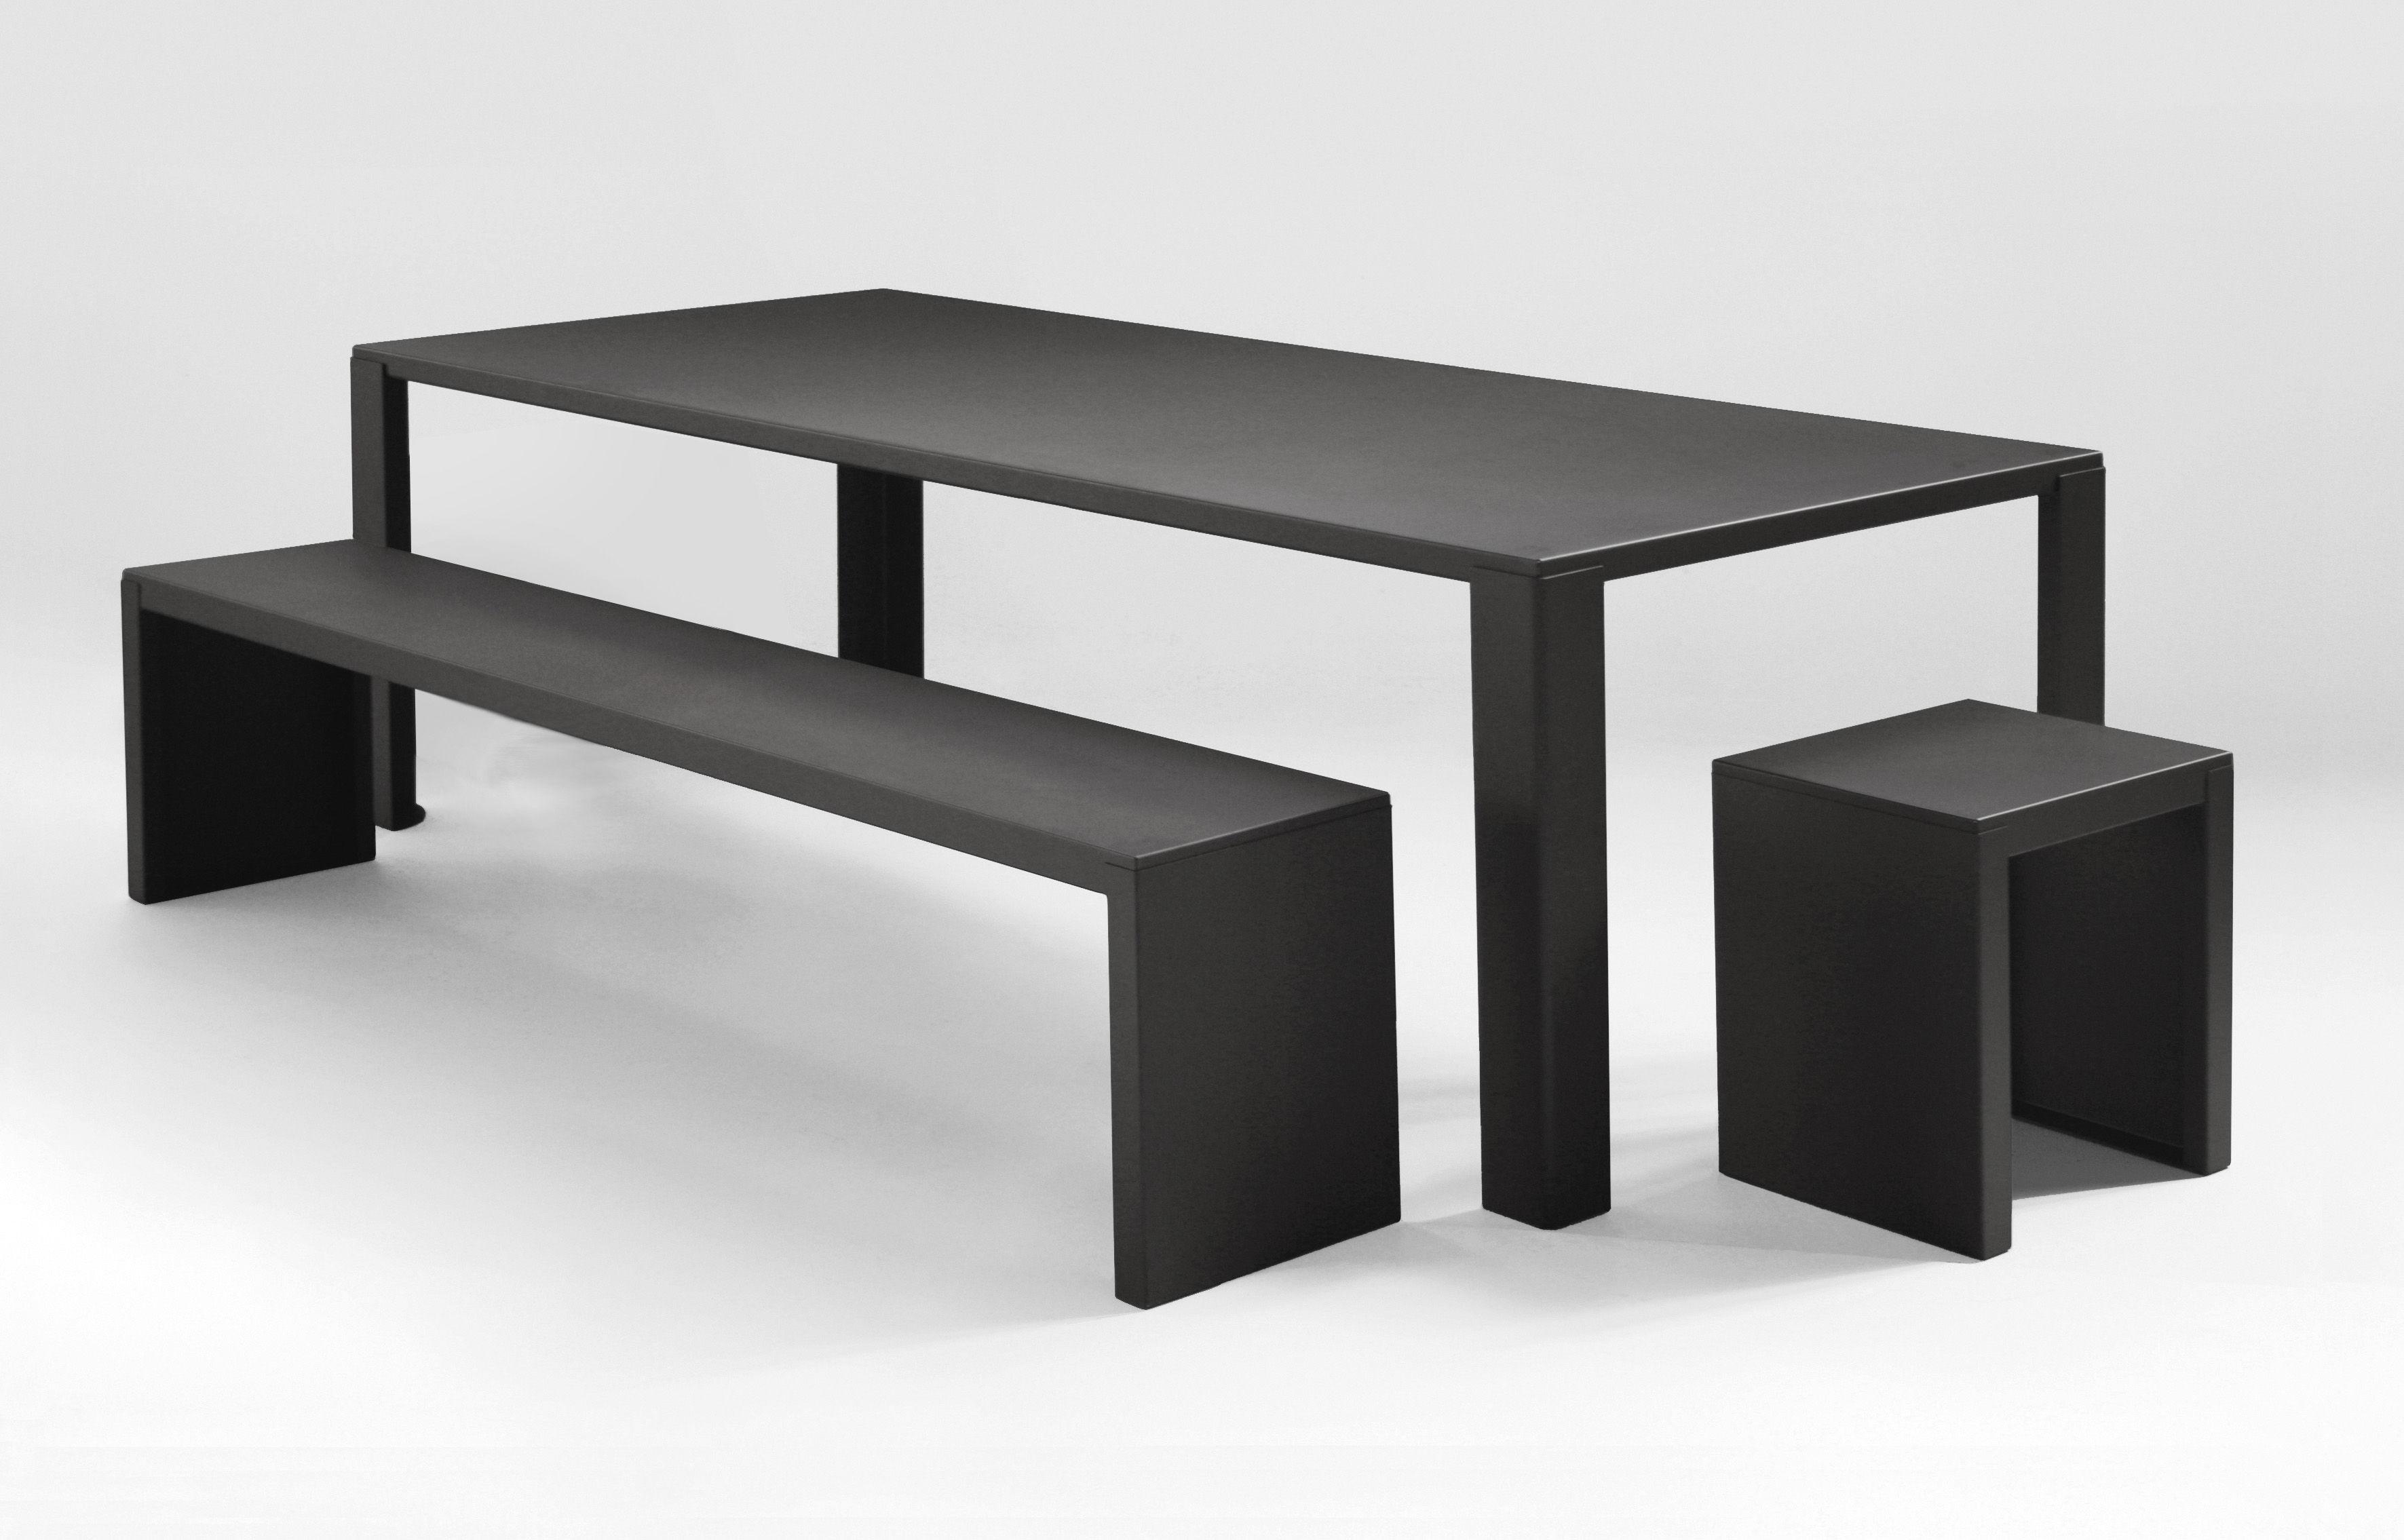 table de jardin big irony outdoor l 200 cm gris chaud zeus. Black Bedroom Furniture Sets. Home Design Ideas